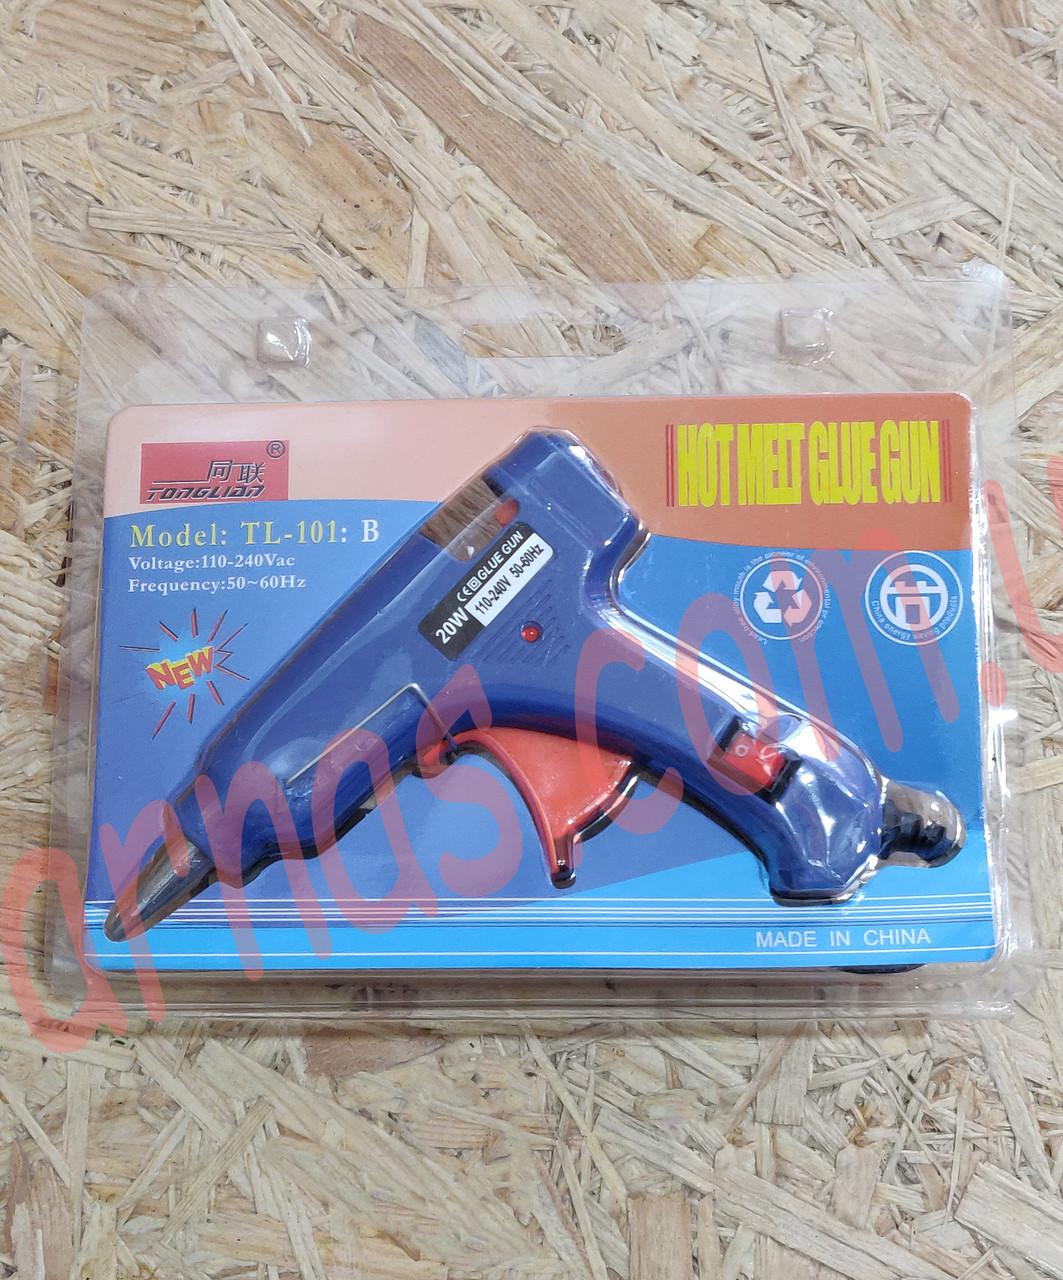 Пистолет клеевой Shun Xin HE-20w (C-46)